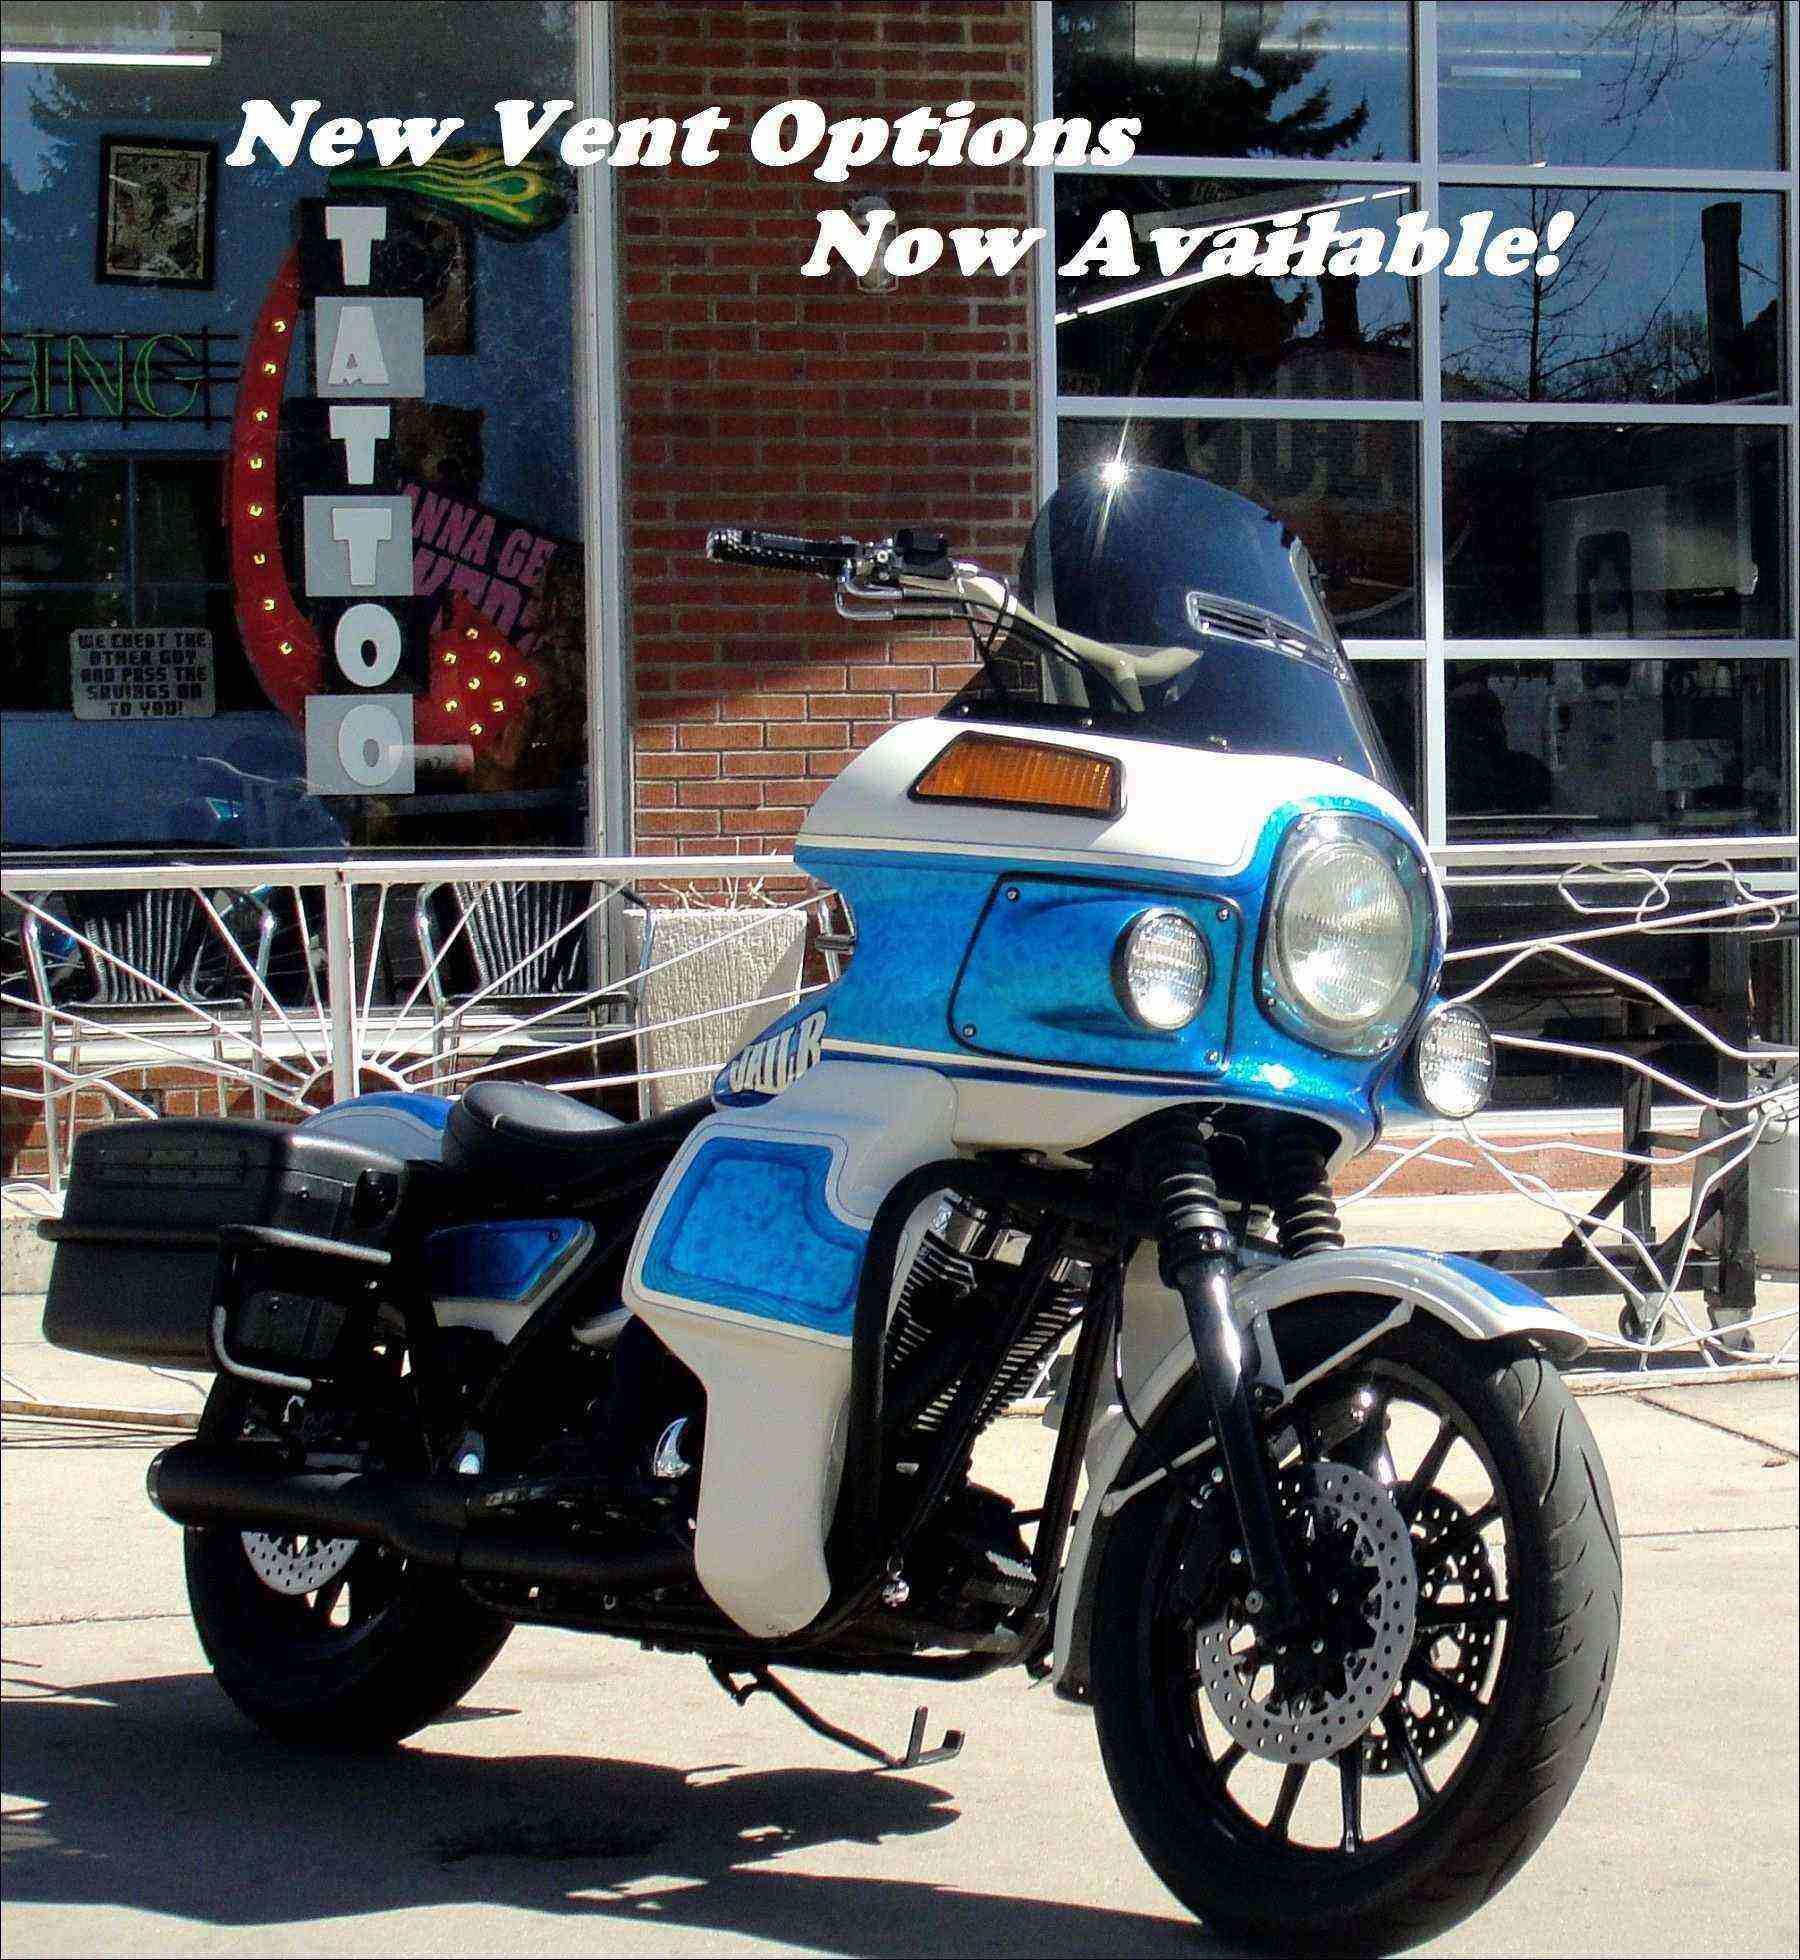 Harley Davidson Sportster 1200 Orange | Aaa Club Motorbike Post - Harley Davidson Headlight Wiring Diagram